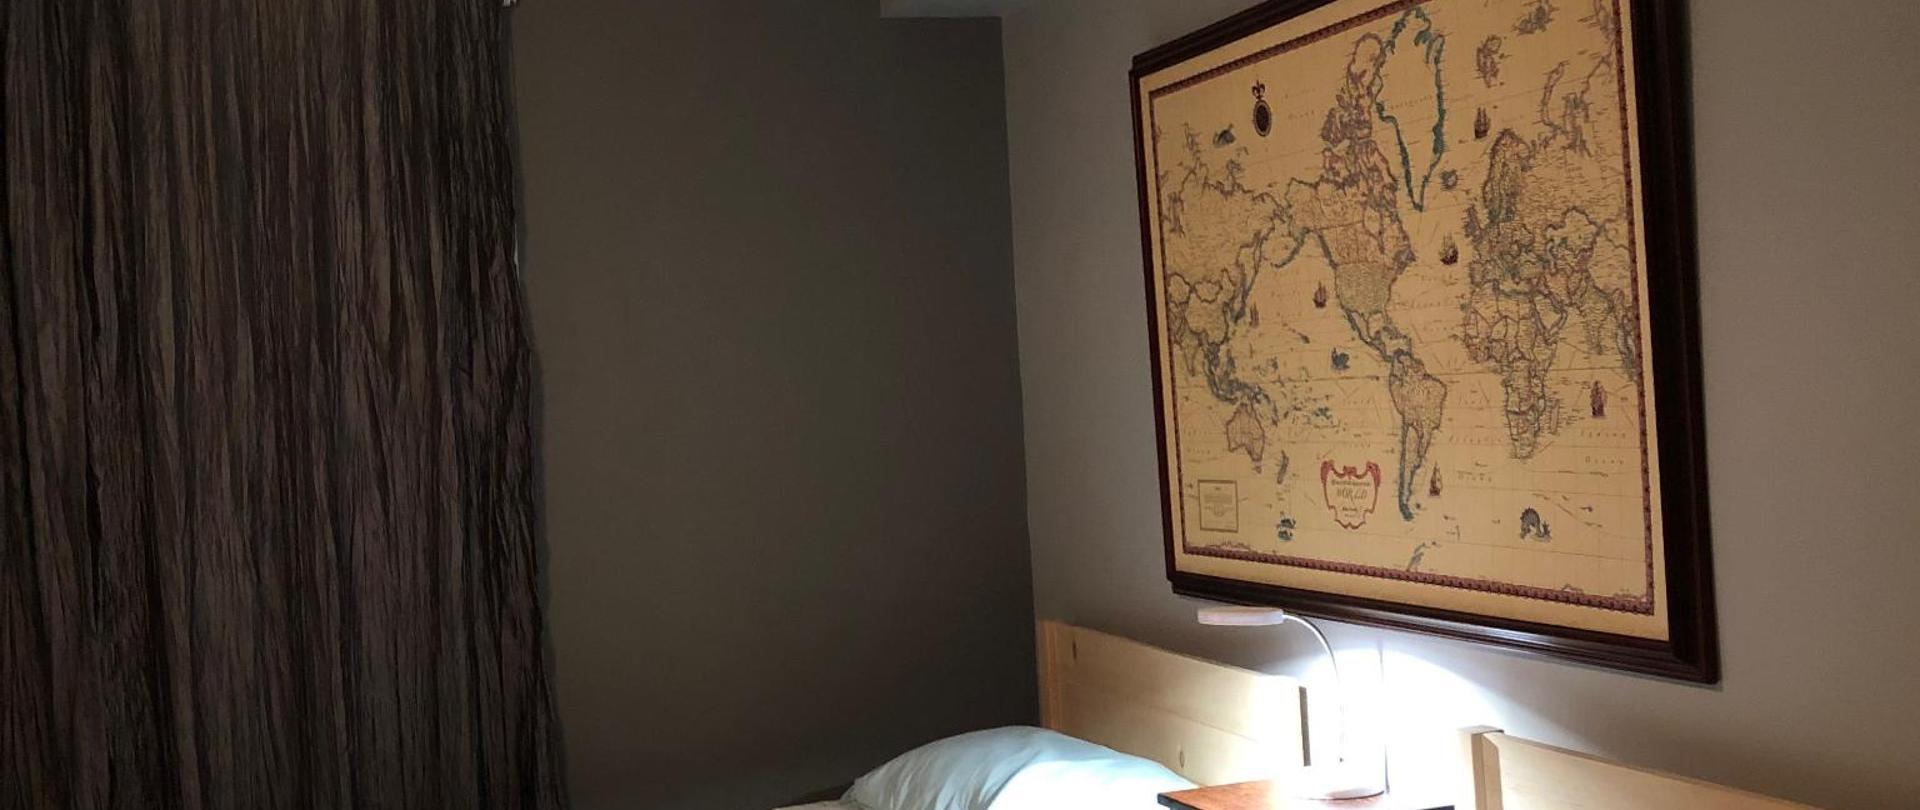 GZ-Chambre 2 lits simples -Magellan3.JPG